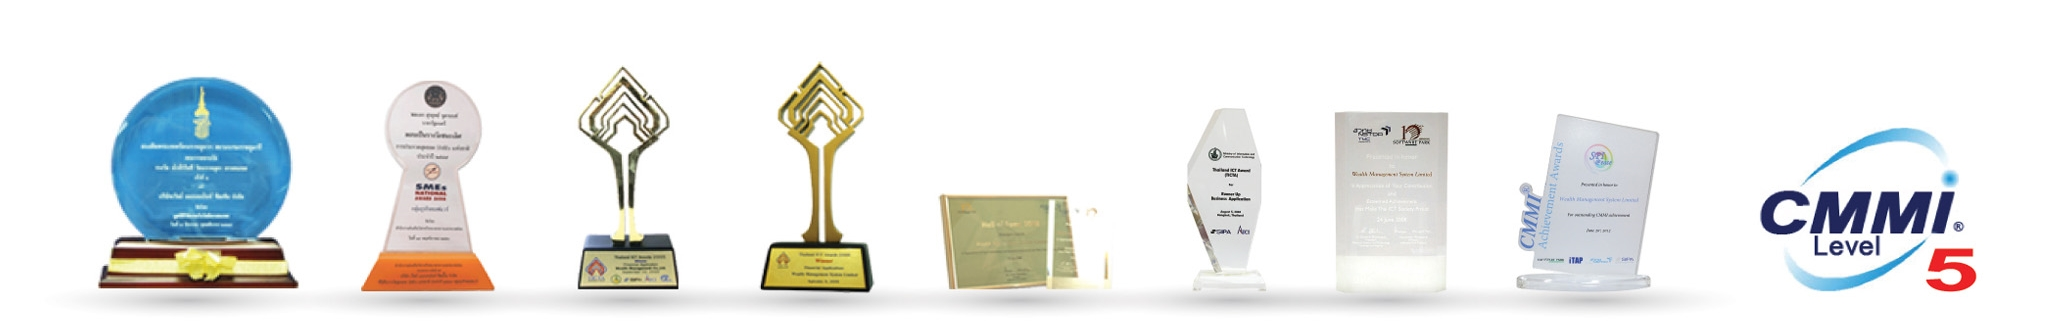 Company Credentials